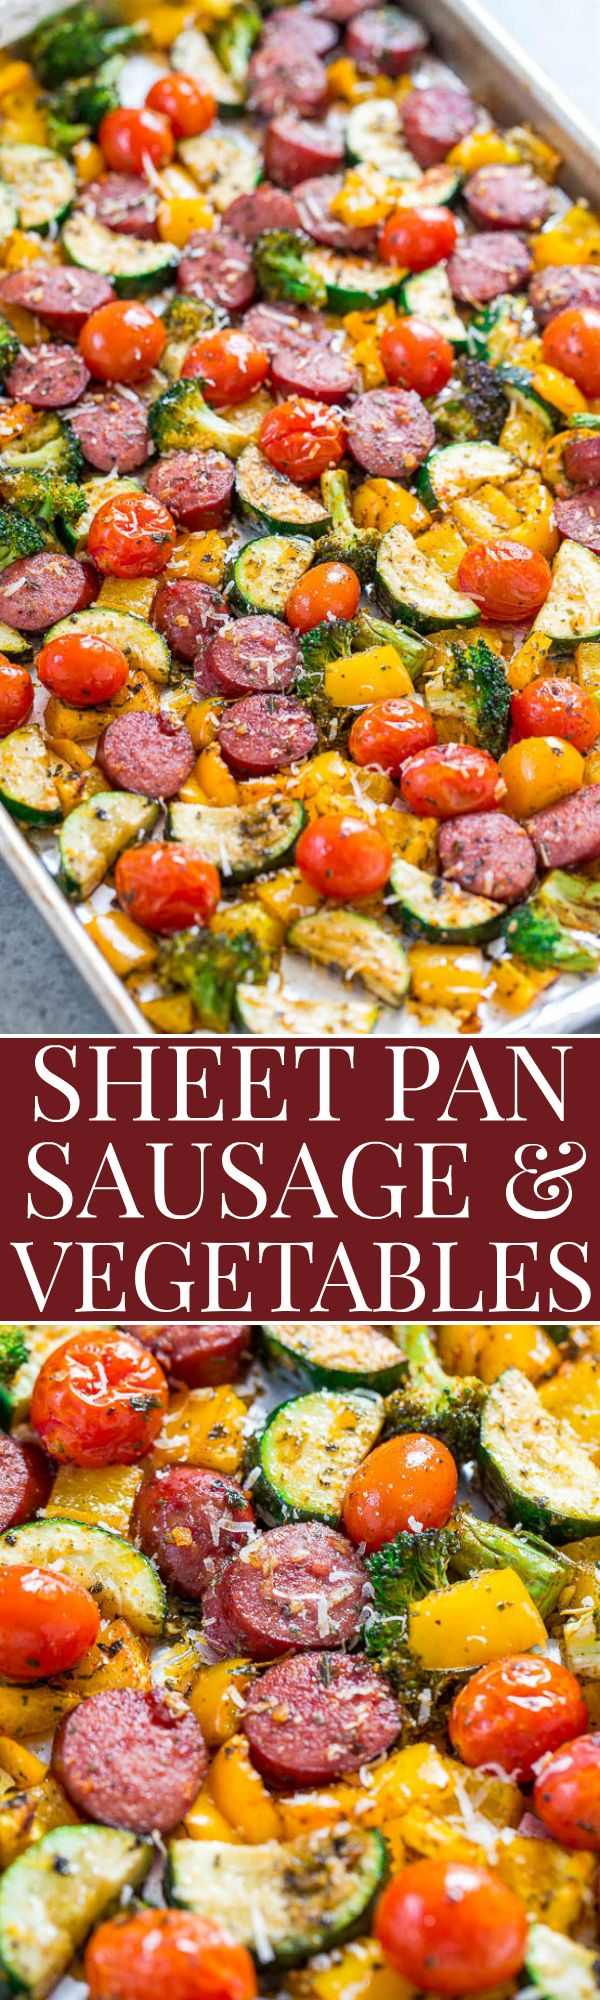 ... sheet pan sausage and vegetables